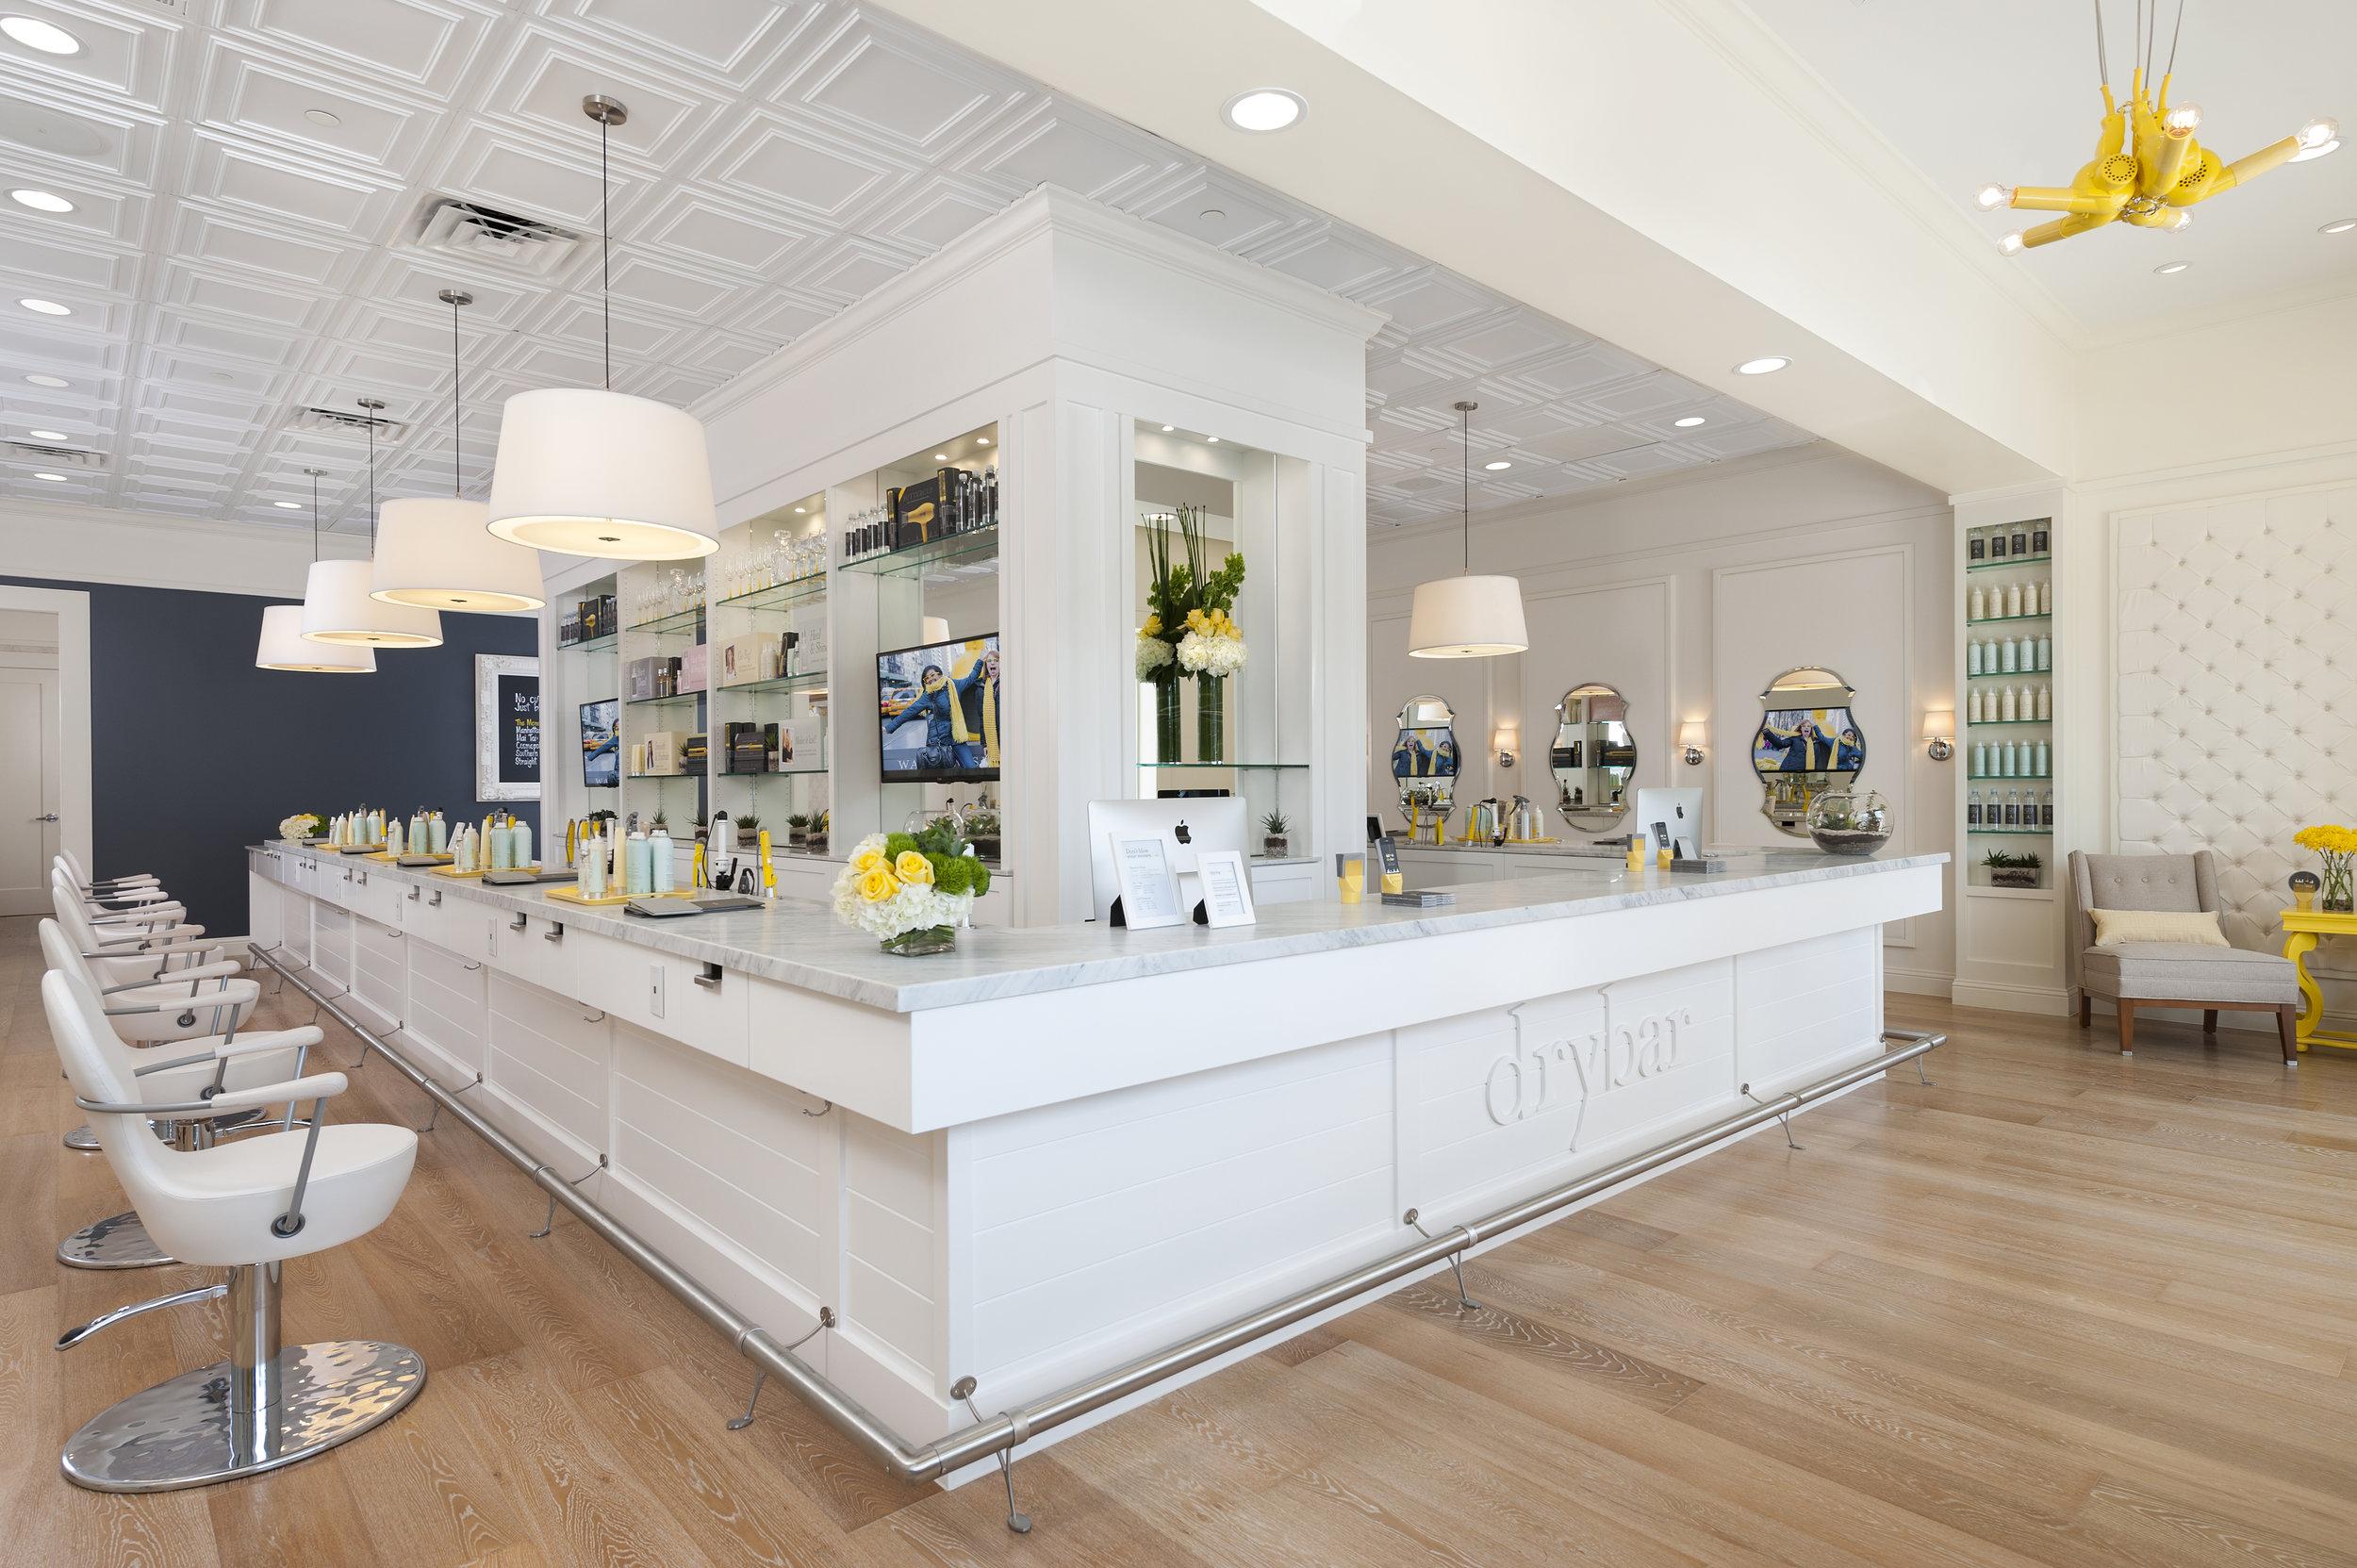 Drybar Shop Interior_Bar.jpg